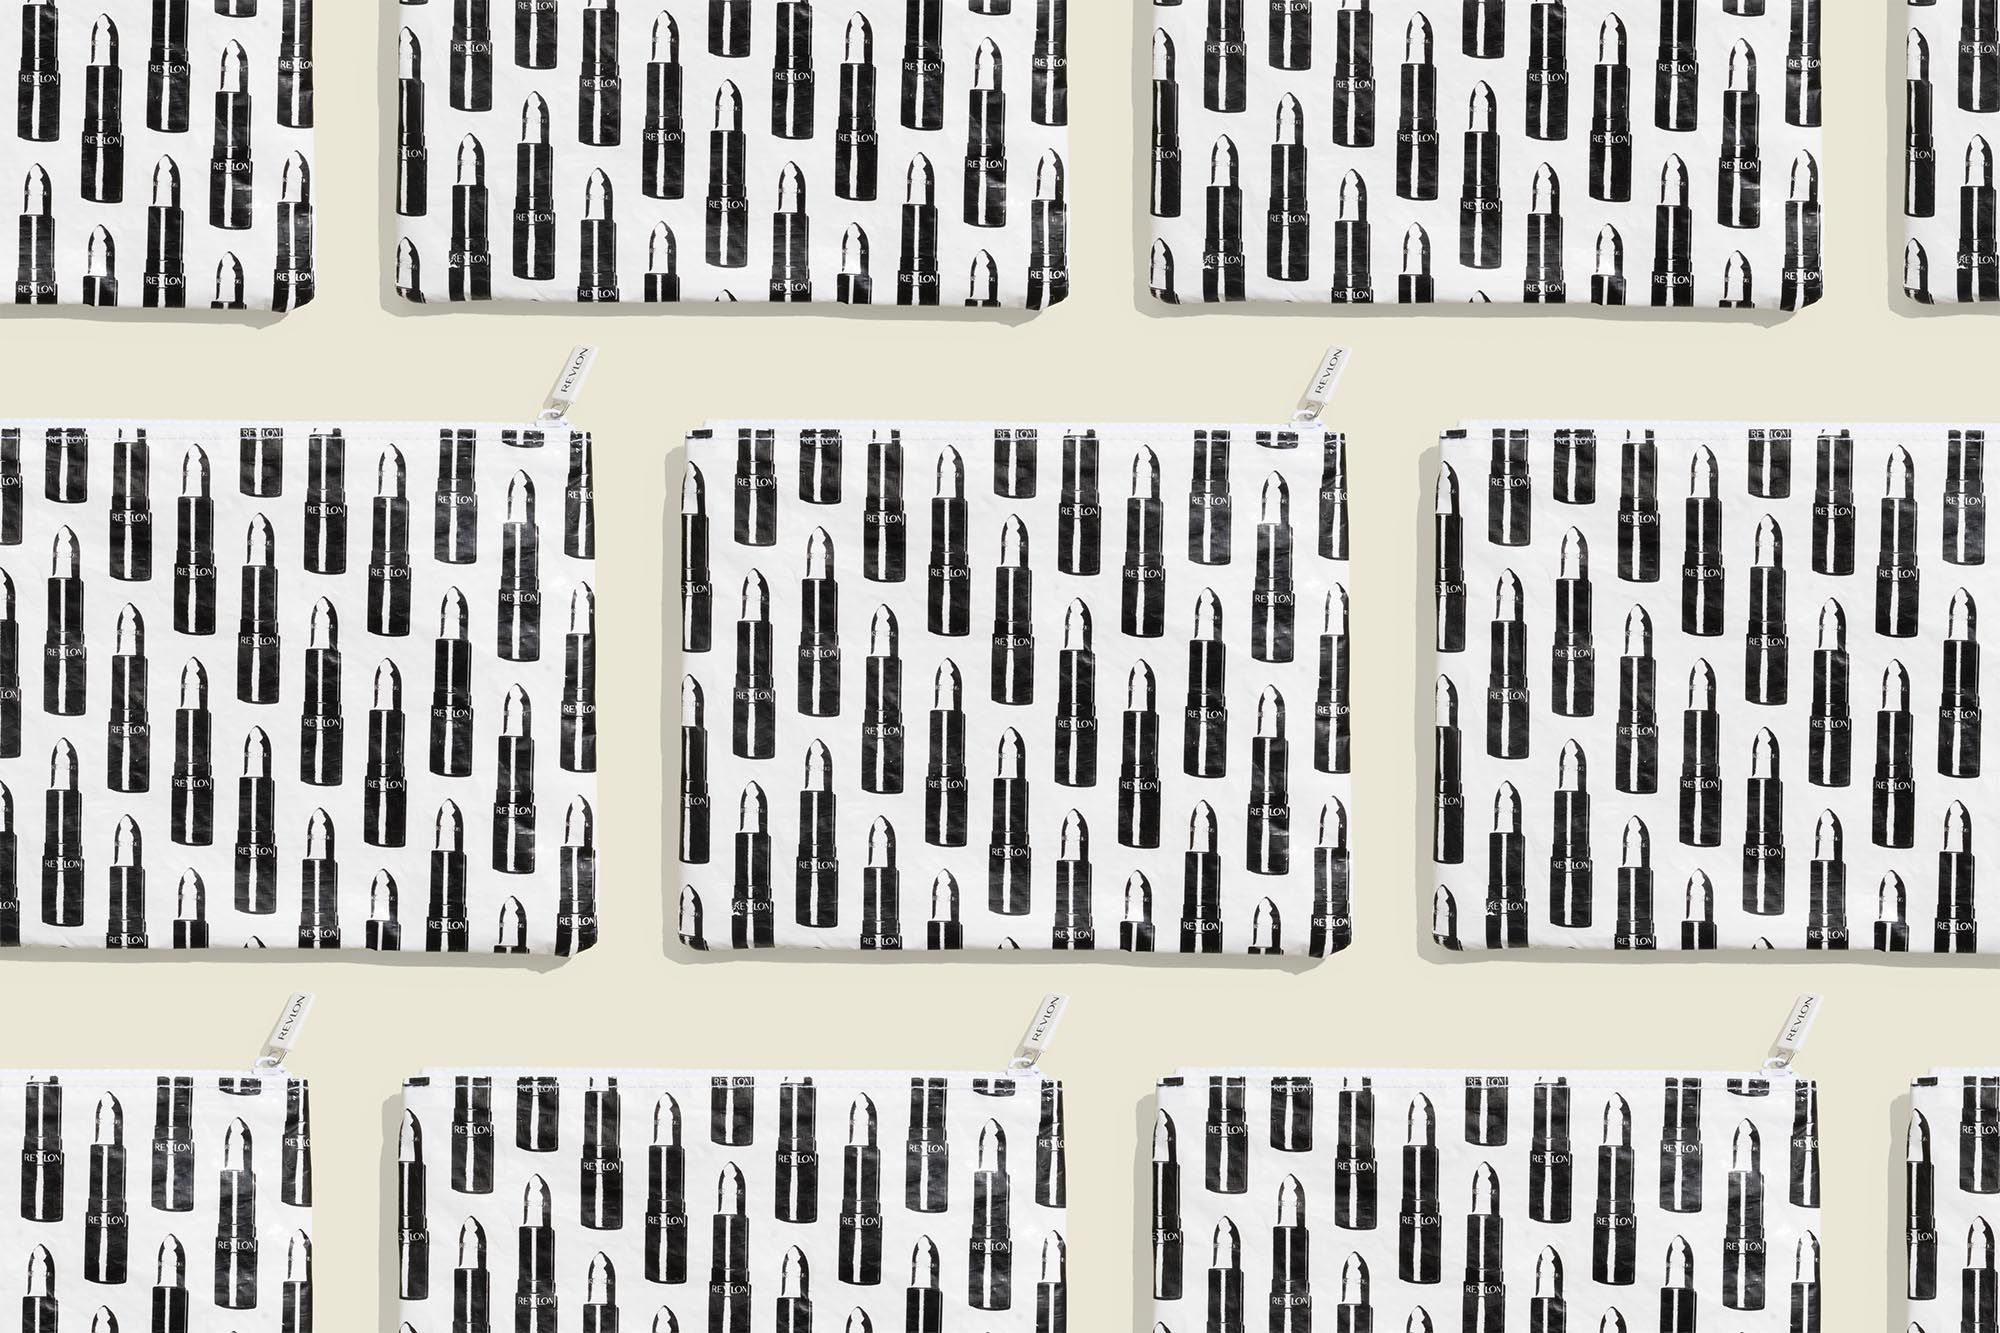 Set of flat zip pouches